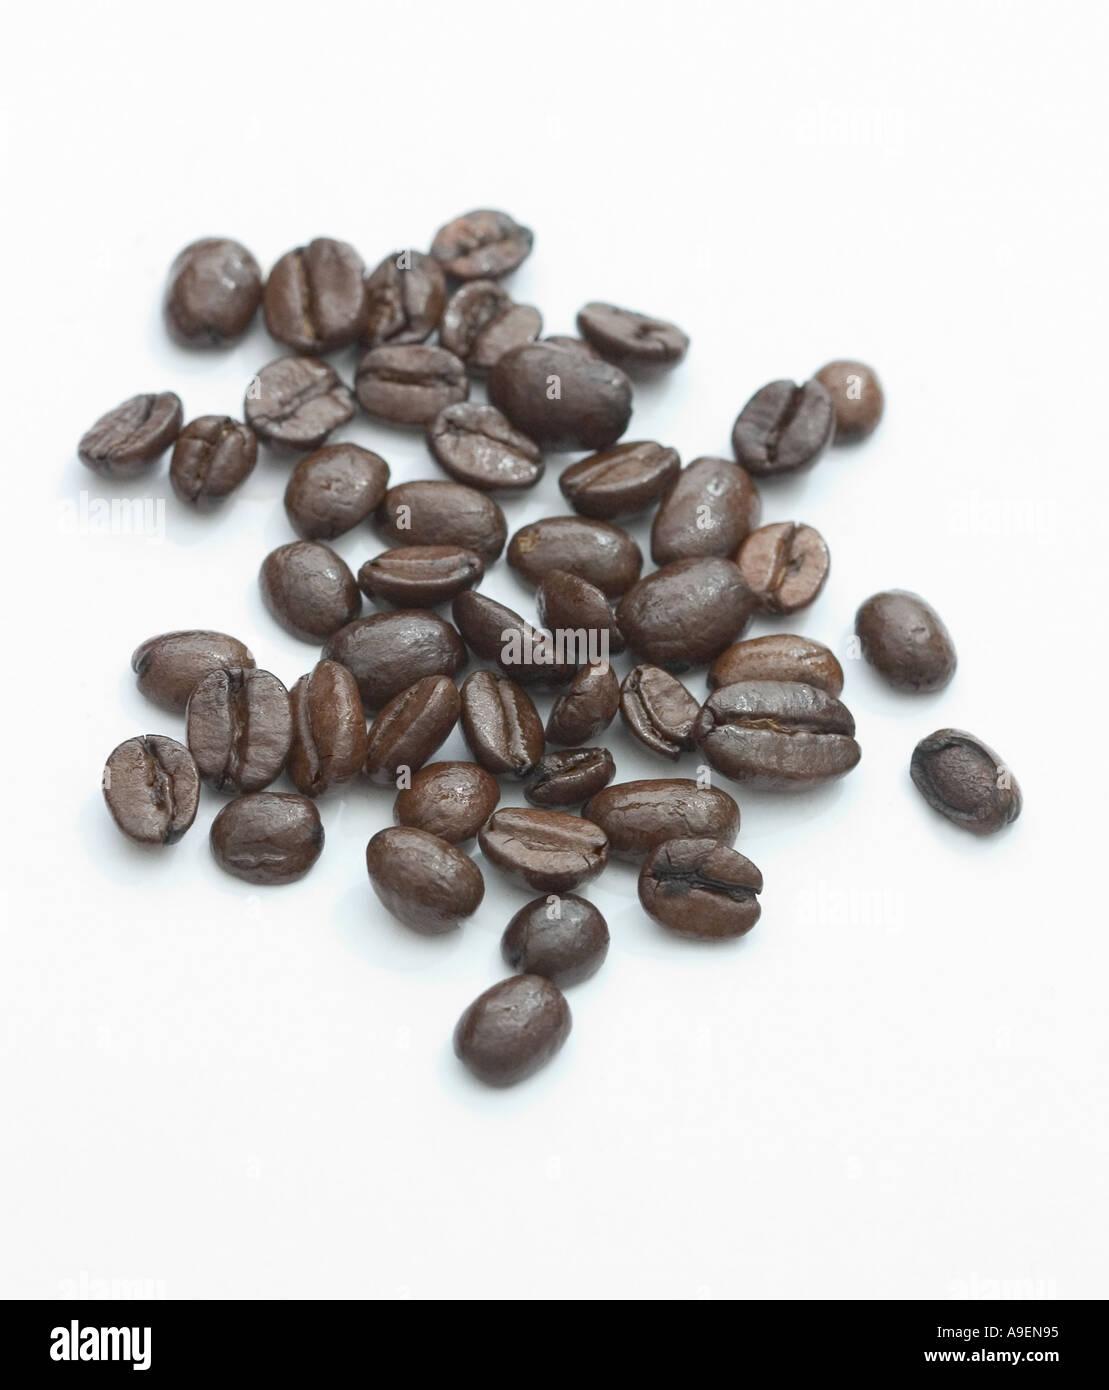 Common name Coffee beans Latin name Coffea arabica - Stock Image